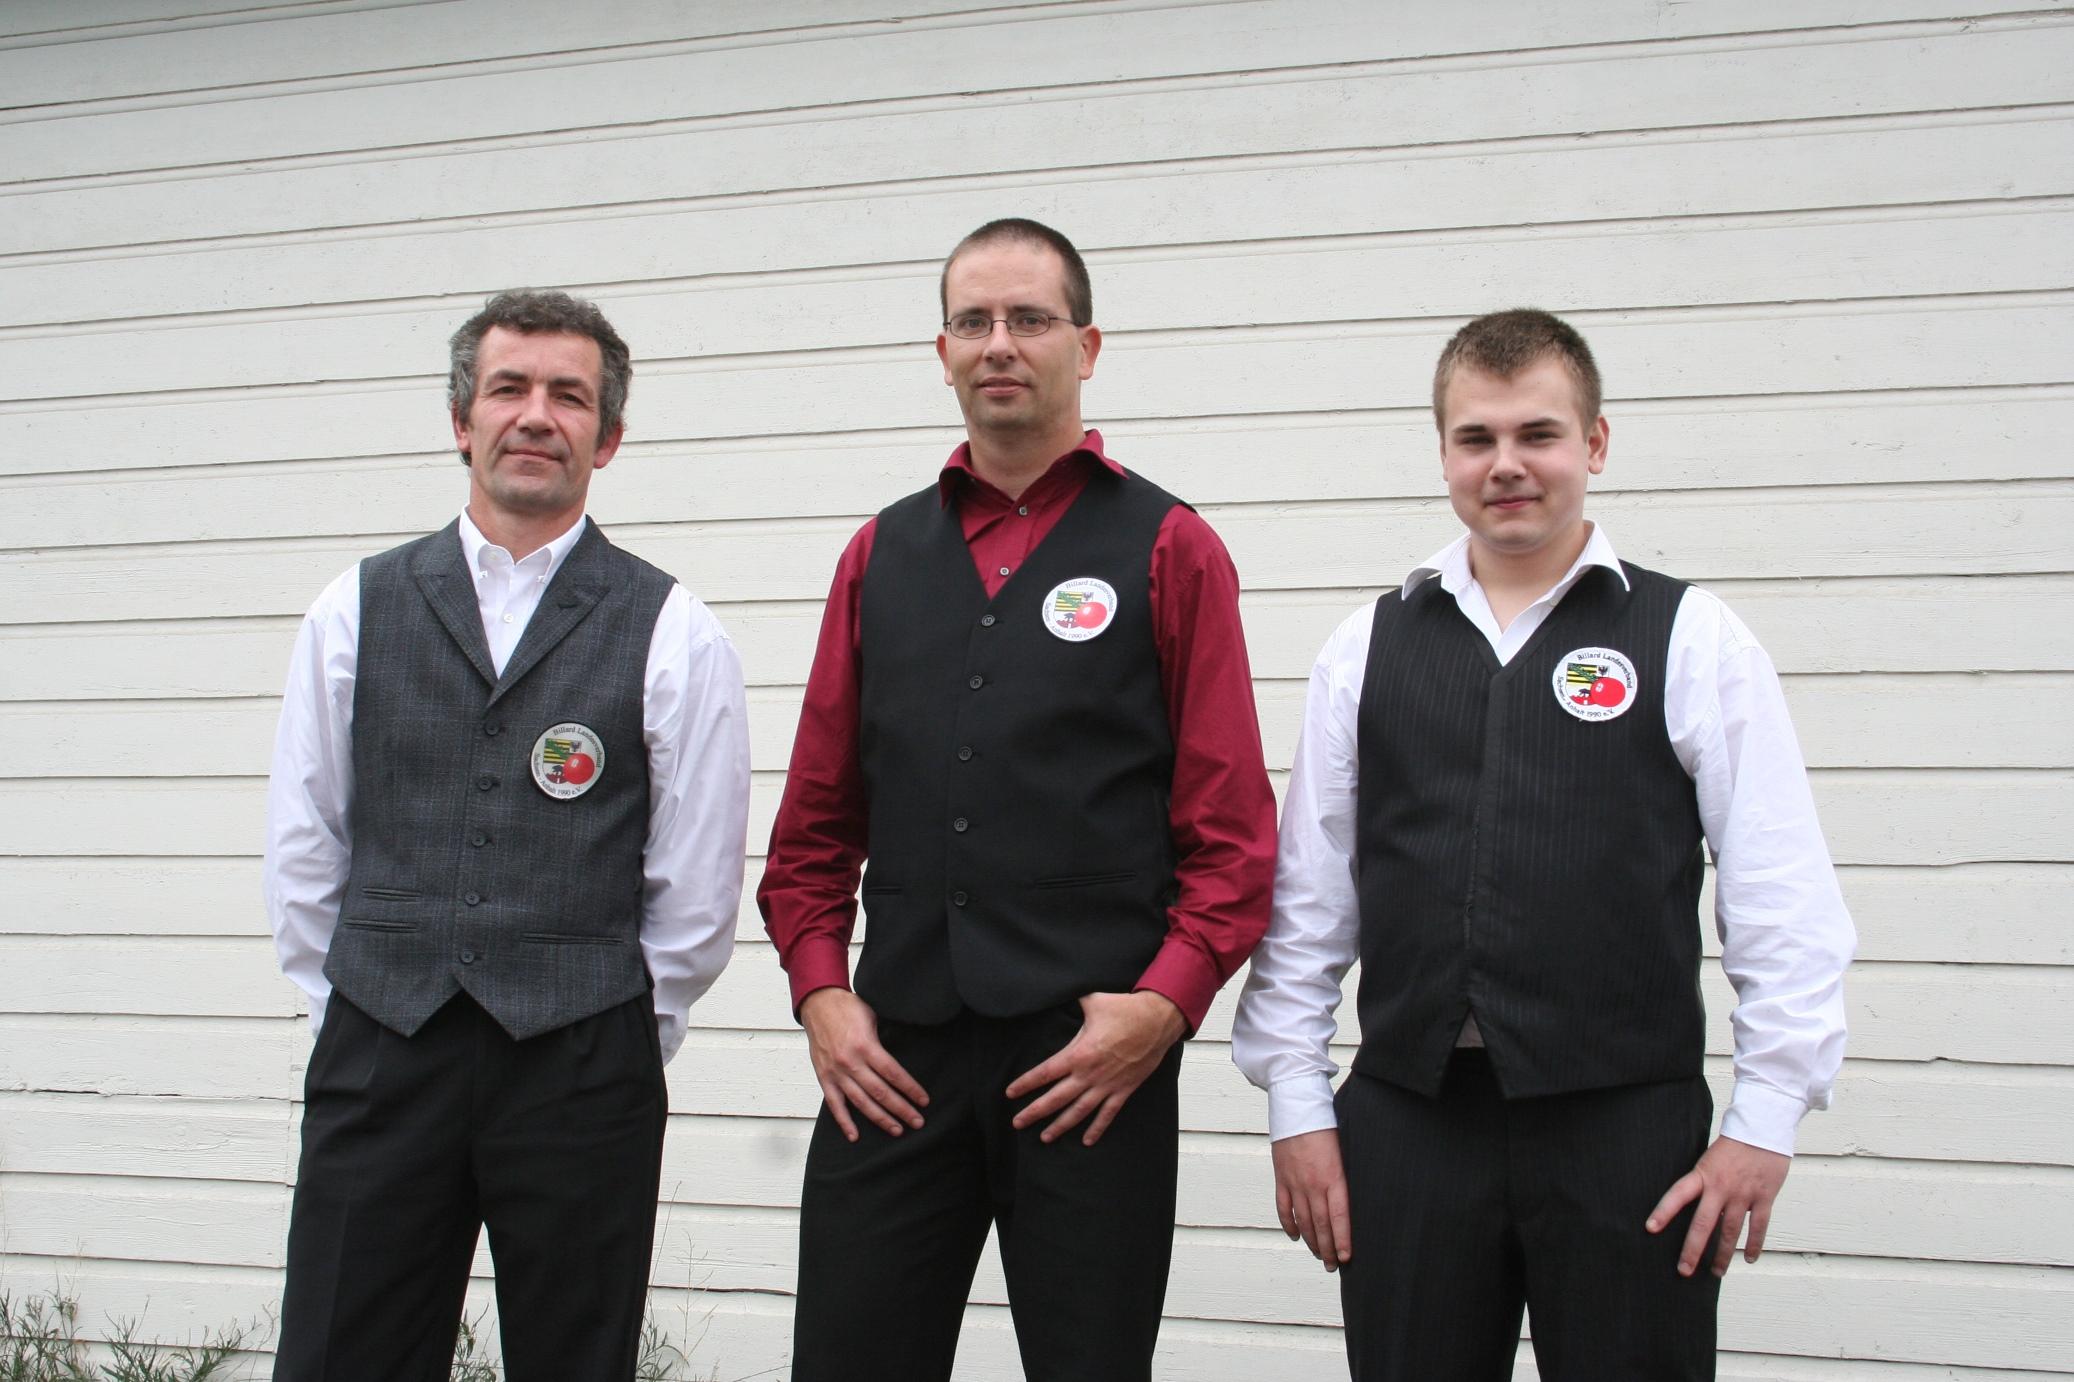 Halle_Snooker_2013-14_Ralf Katzenellenbogen_Jens Rebmann_Stefan Gose_IMG_0732